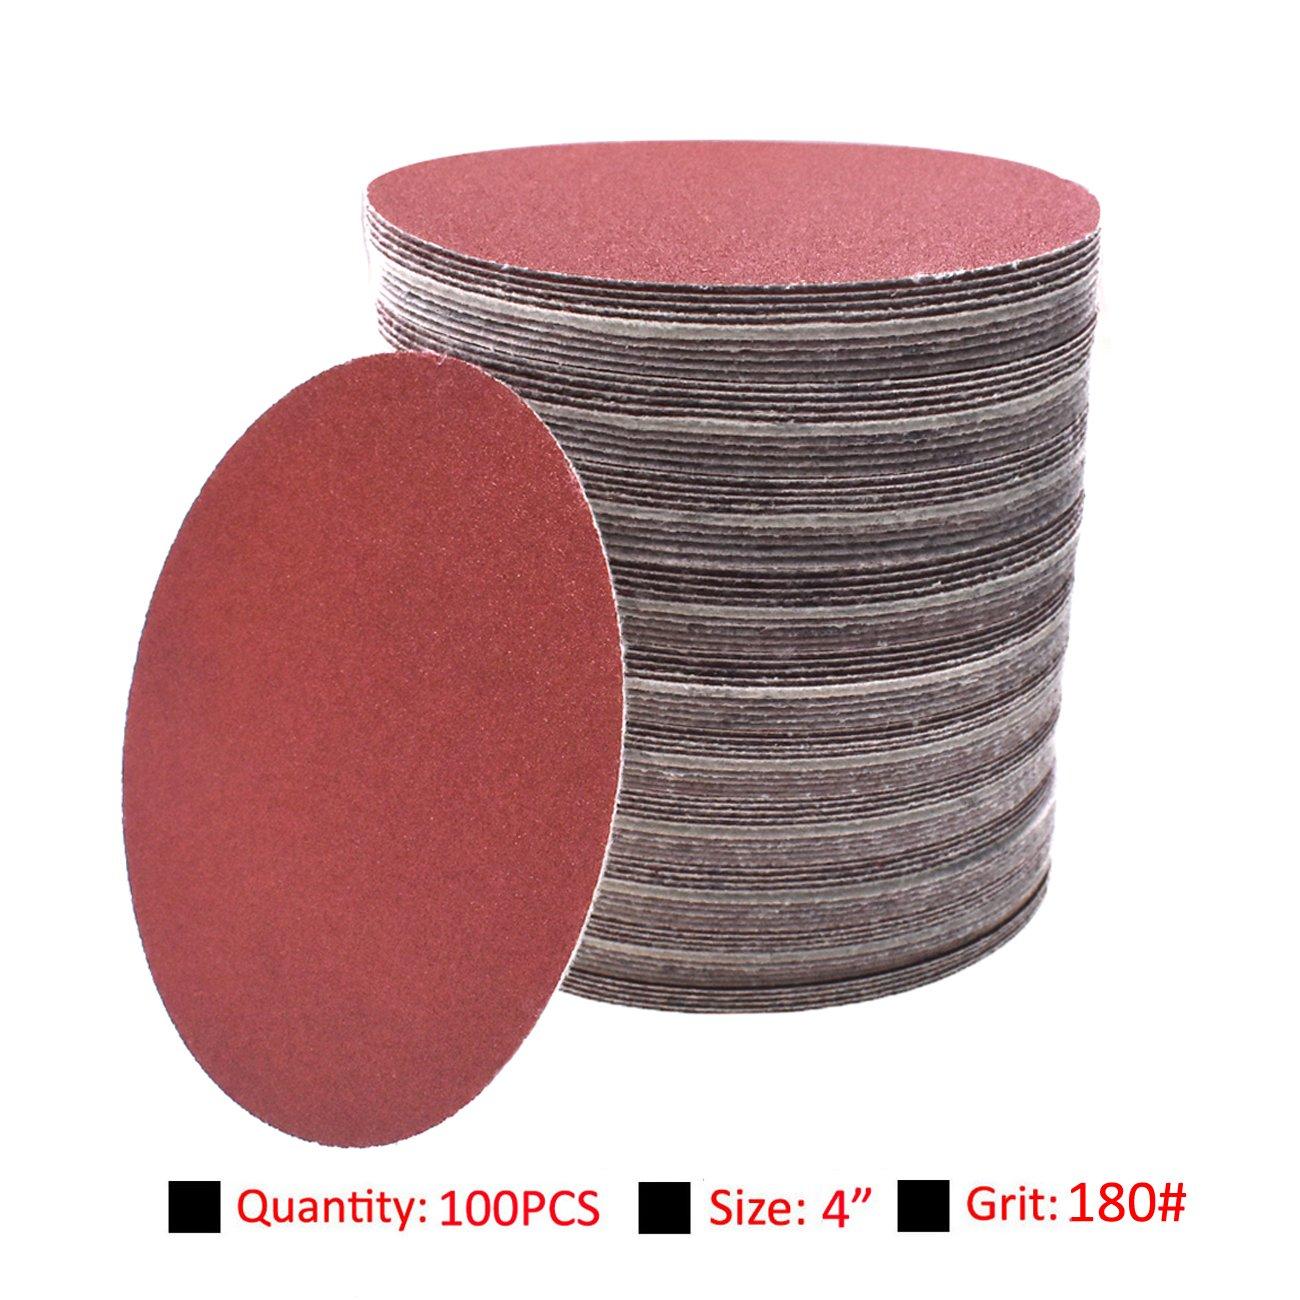 NAVARME 100pcs 100mm 4 Inch Sanding Disc 180 Grit Orbital Sander Pads Abrasive Sandpaper